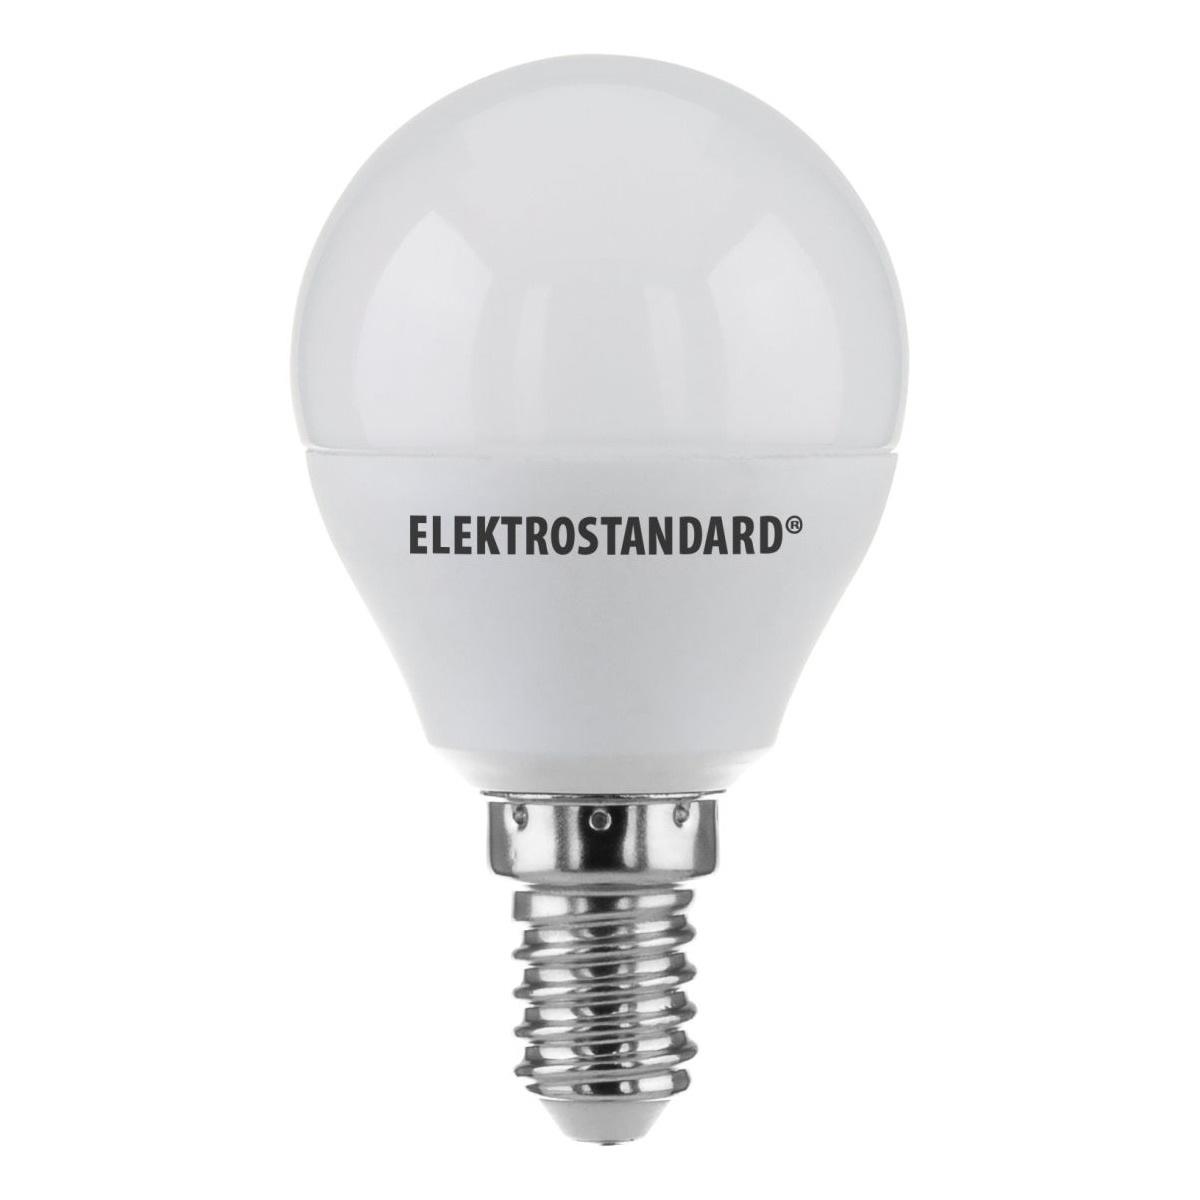 лампа светодиодная e14 7w 3300k шар матовый mini 4690389085376 Лампочка Elektrostandard светодиодная Mini Classic LED 7W 3300K E14 матовое стекло, Теплый свет 7 Вт, Светодиодная